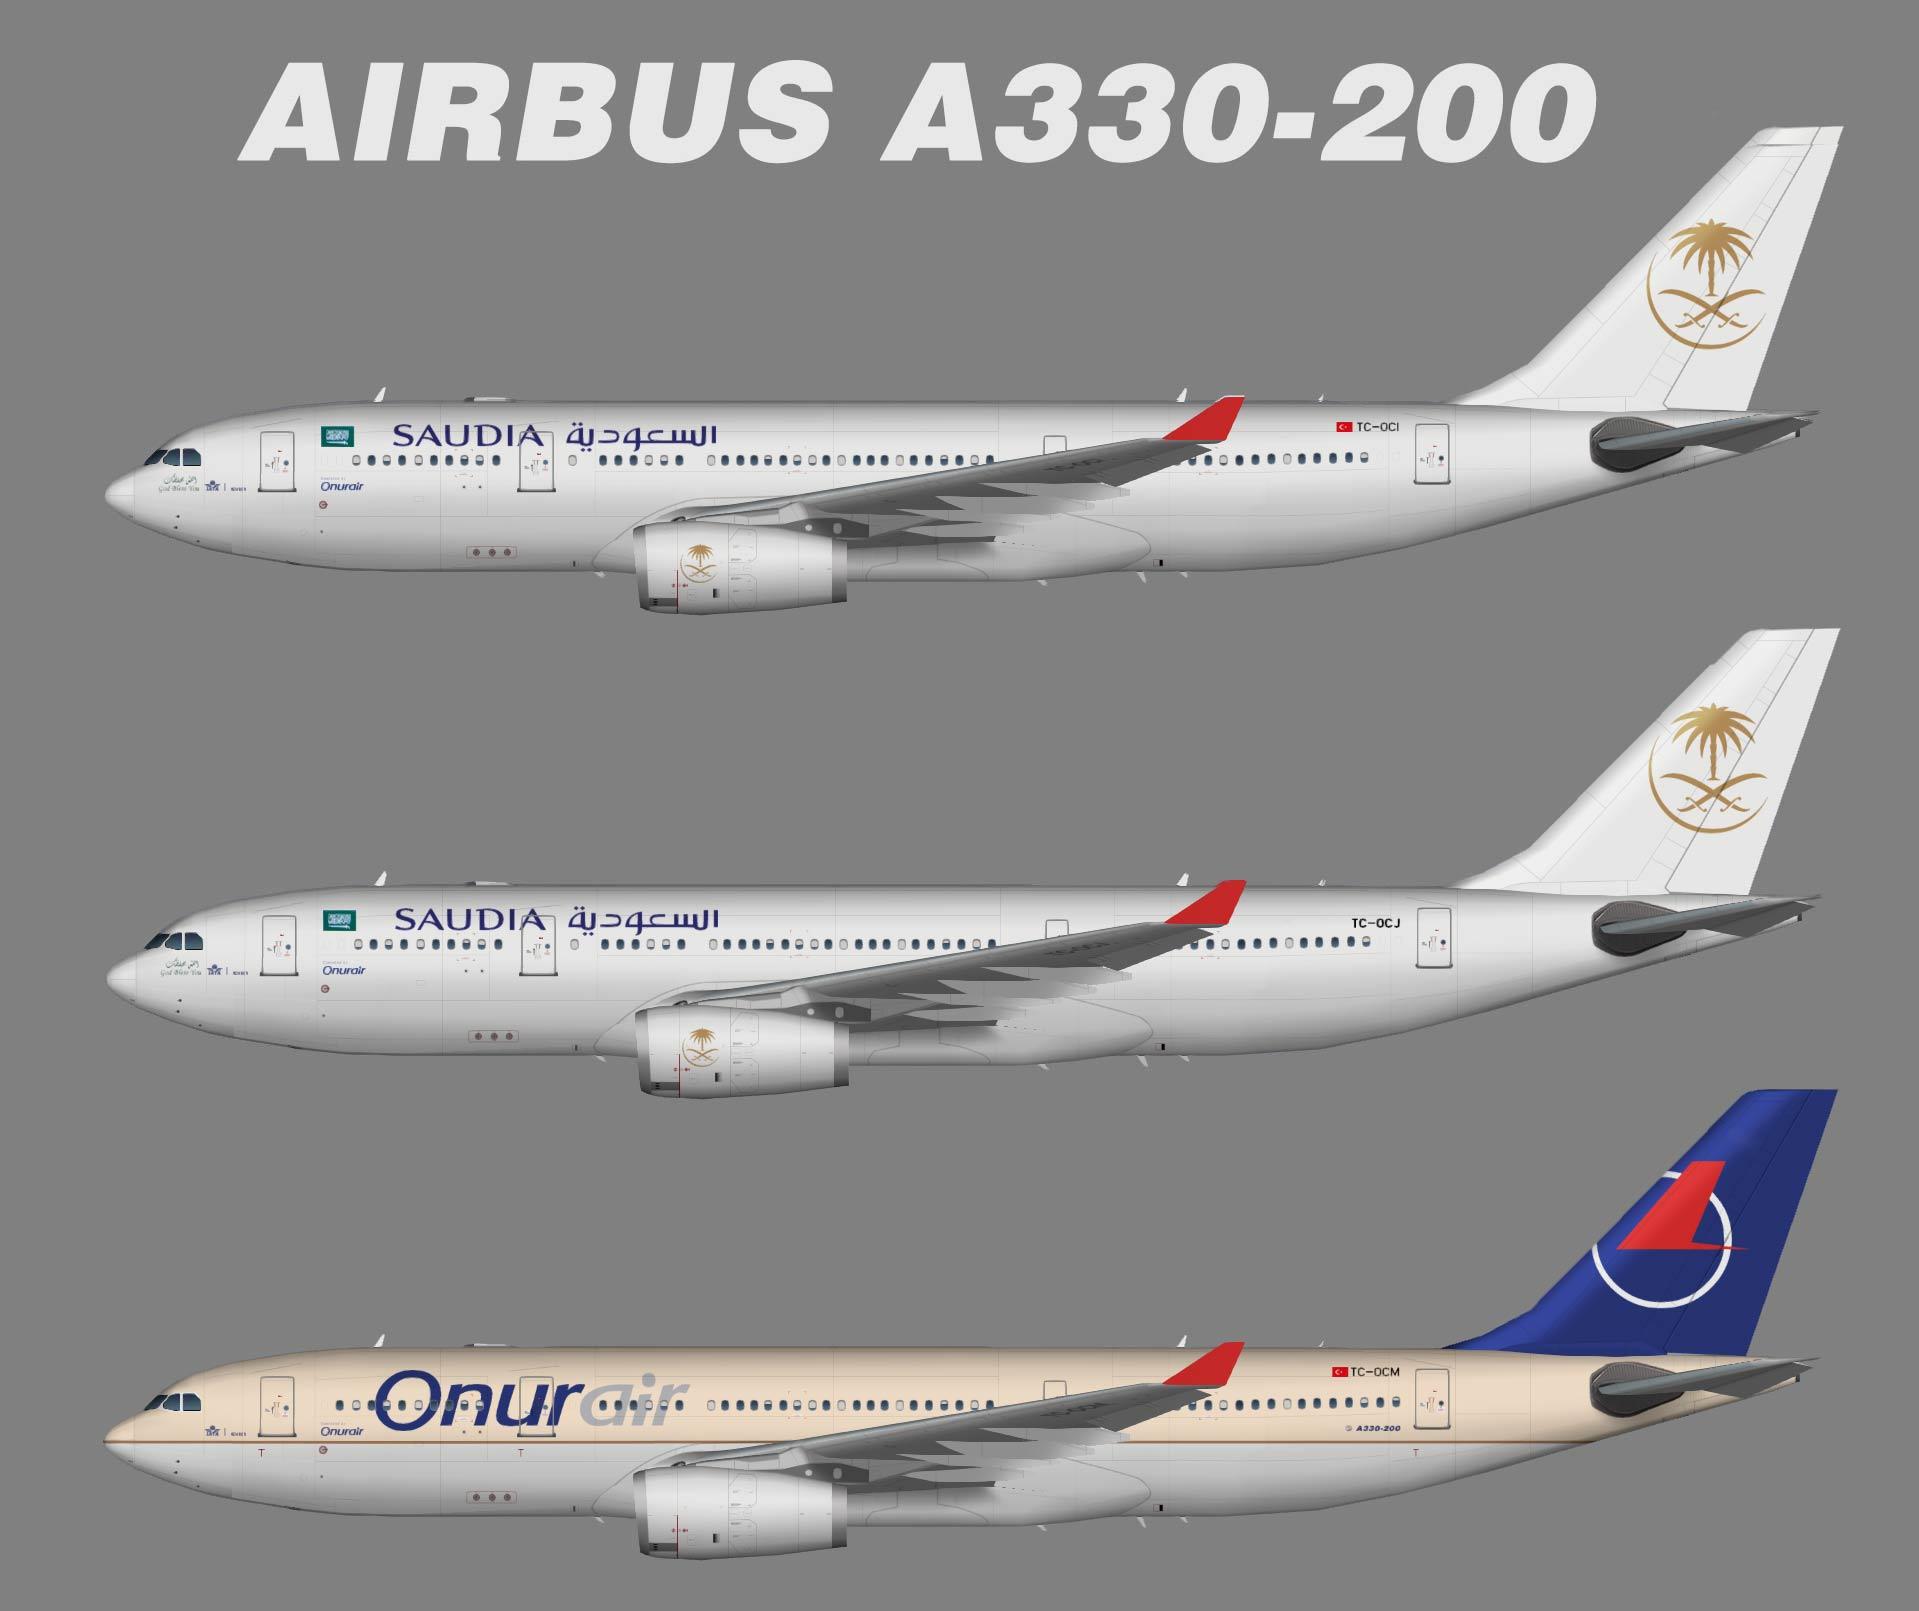 Saudia Airbus A330-200 Opb. Onur Air